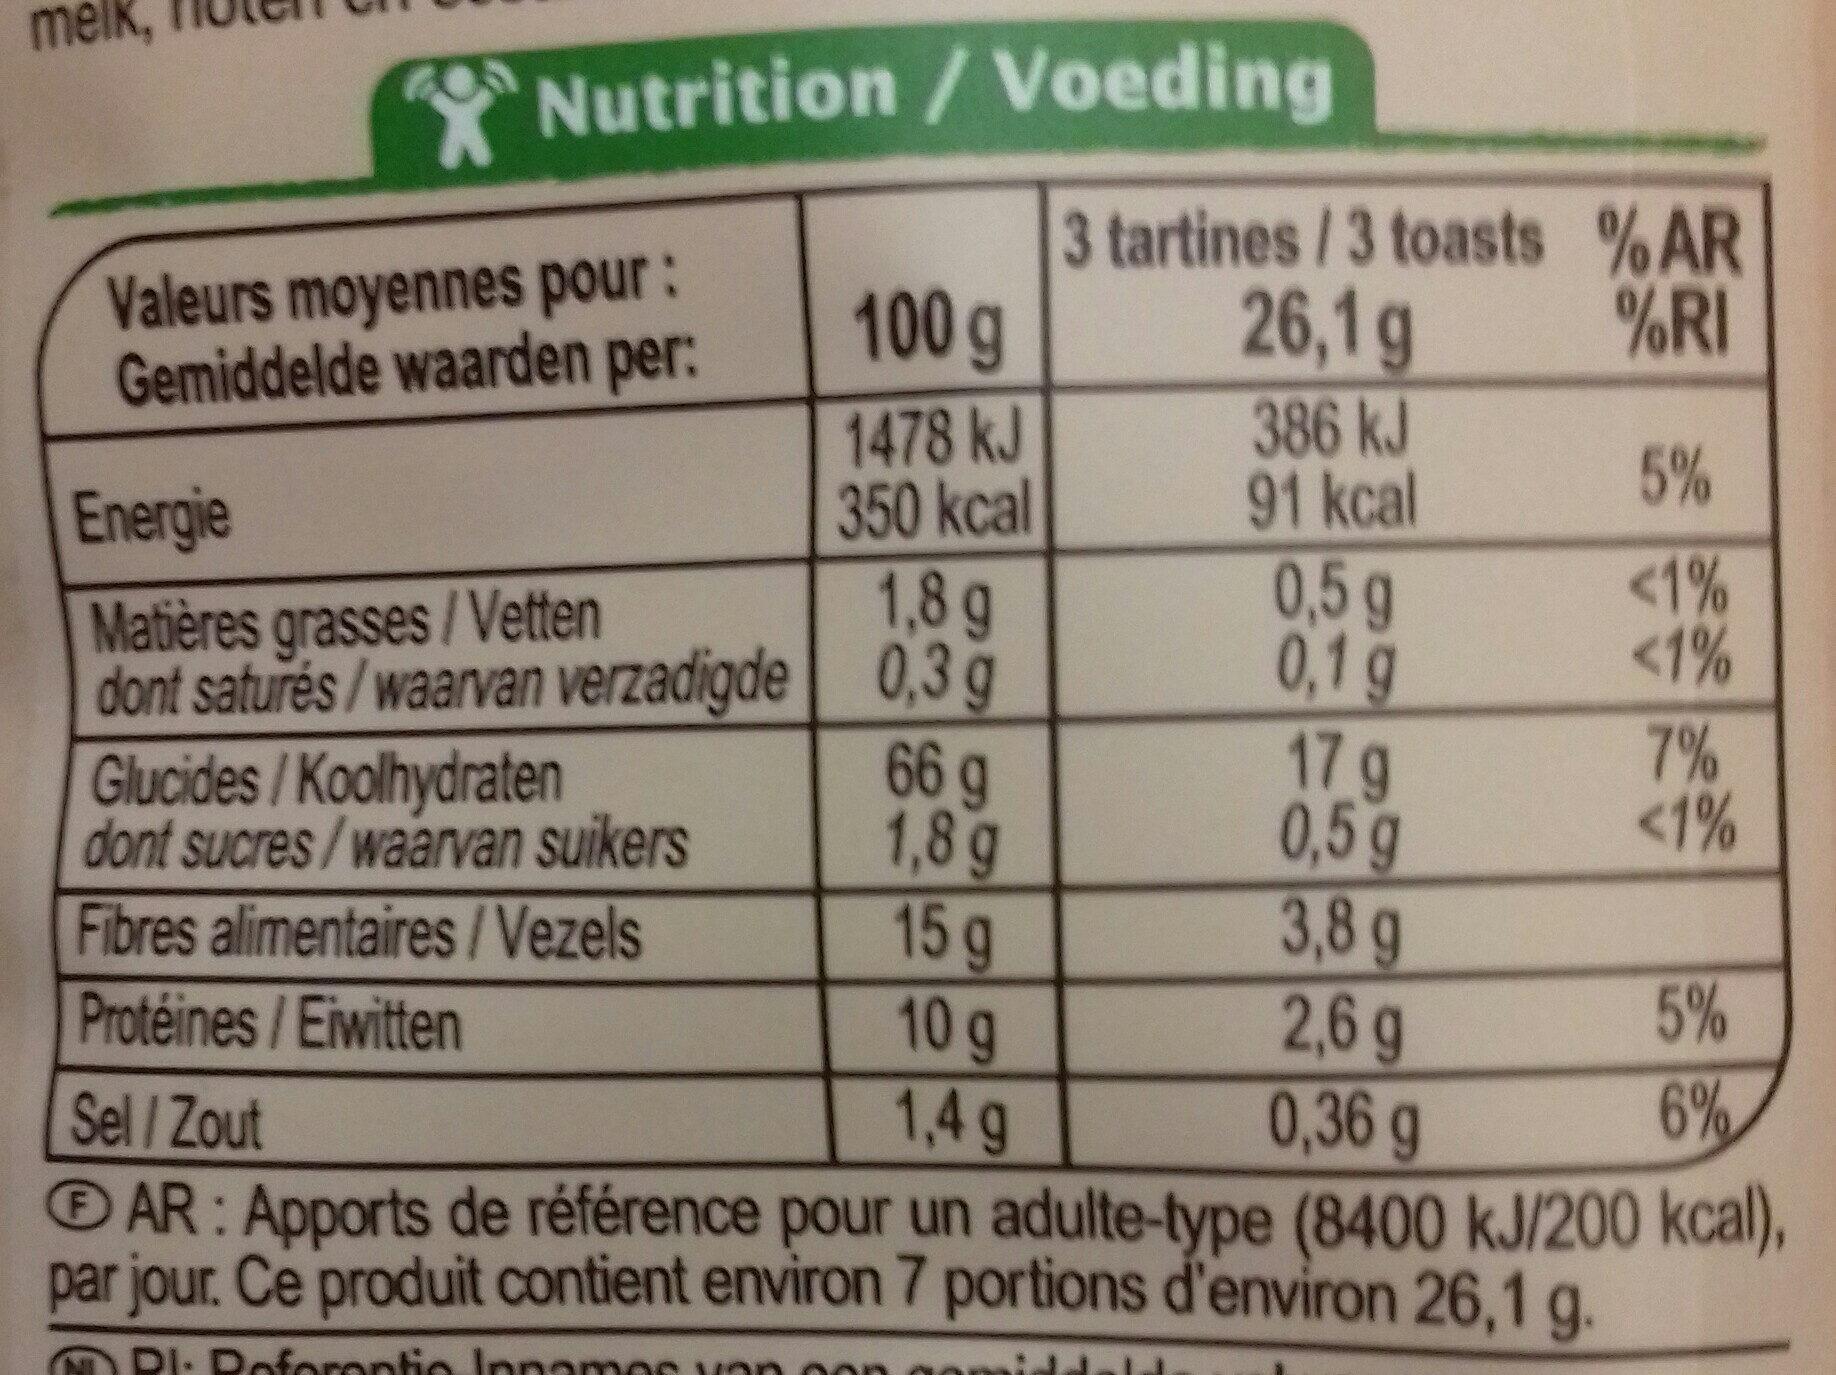 Tartines croustillantes au Seigle - Voedingswaarden - fr